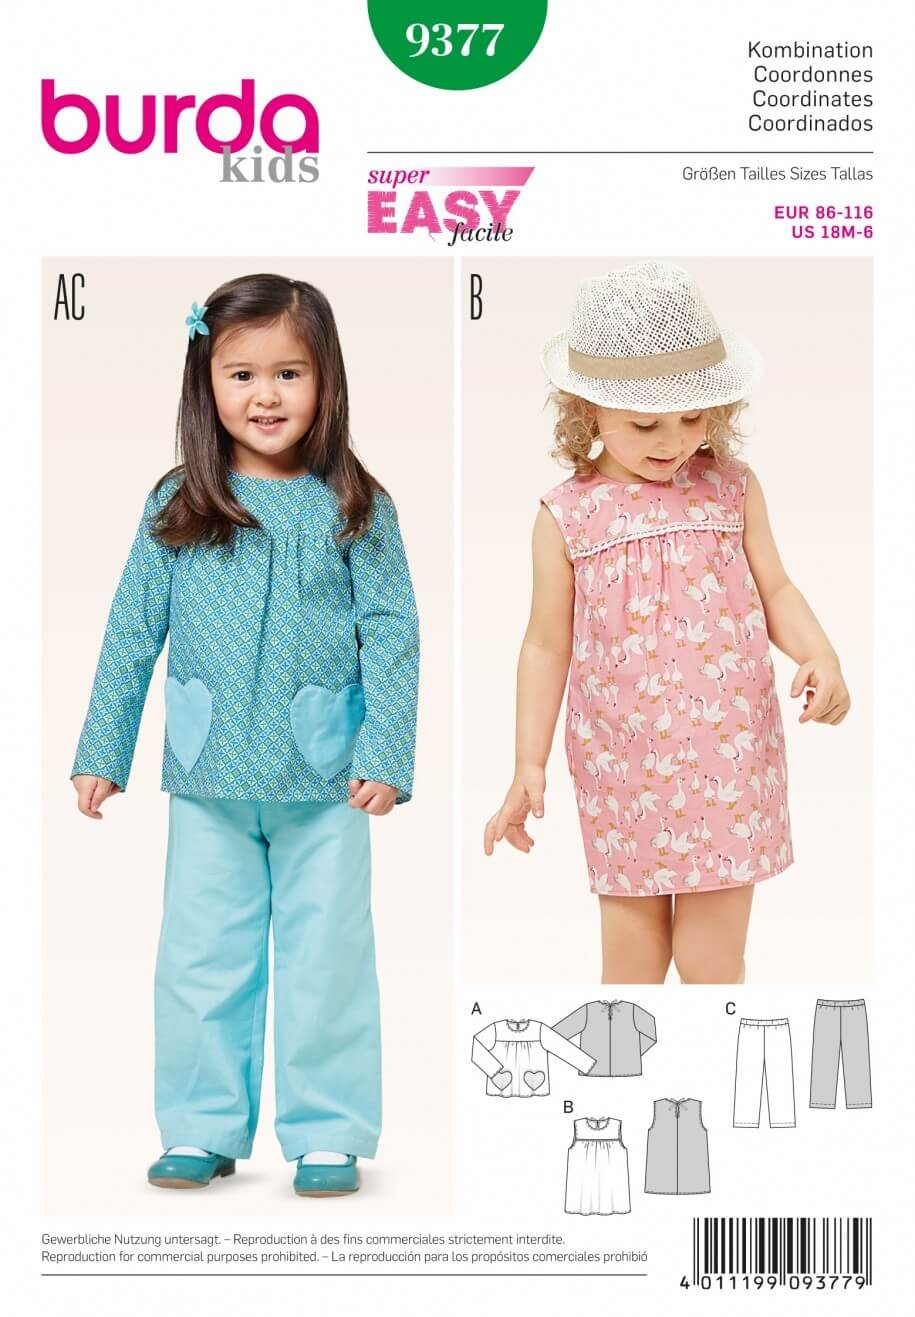 Burda Kids Coordinates Yoke Blouse Trousers  Dress Sewing Pattern 9377